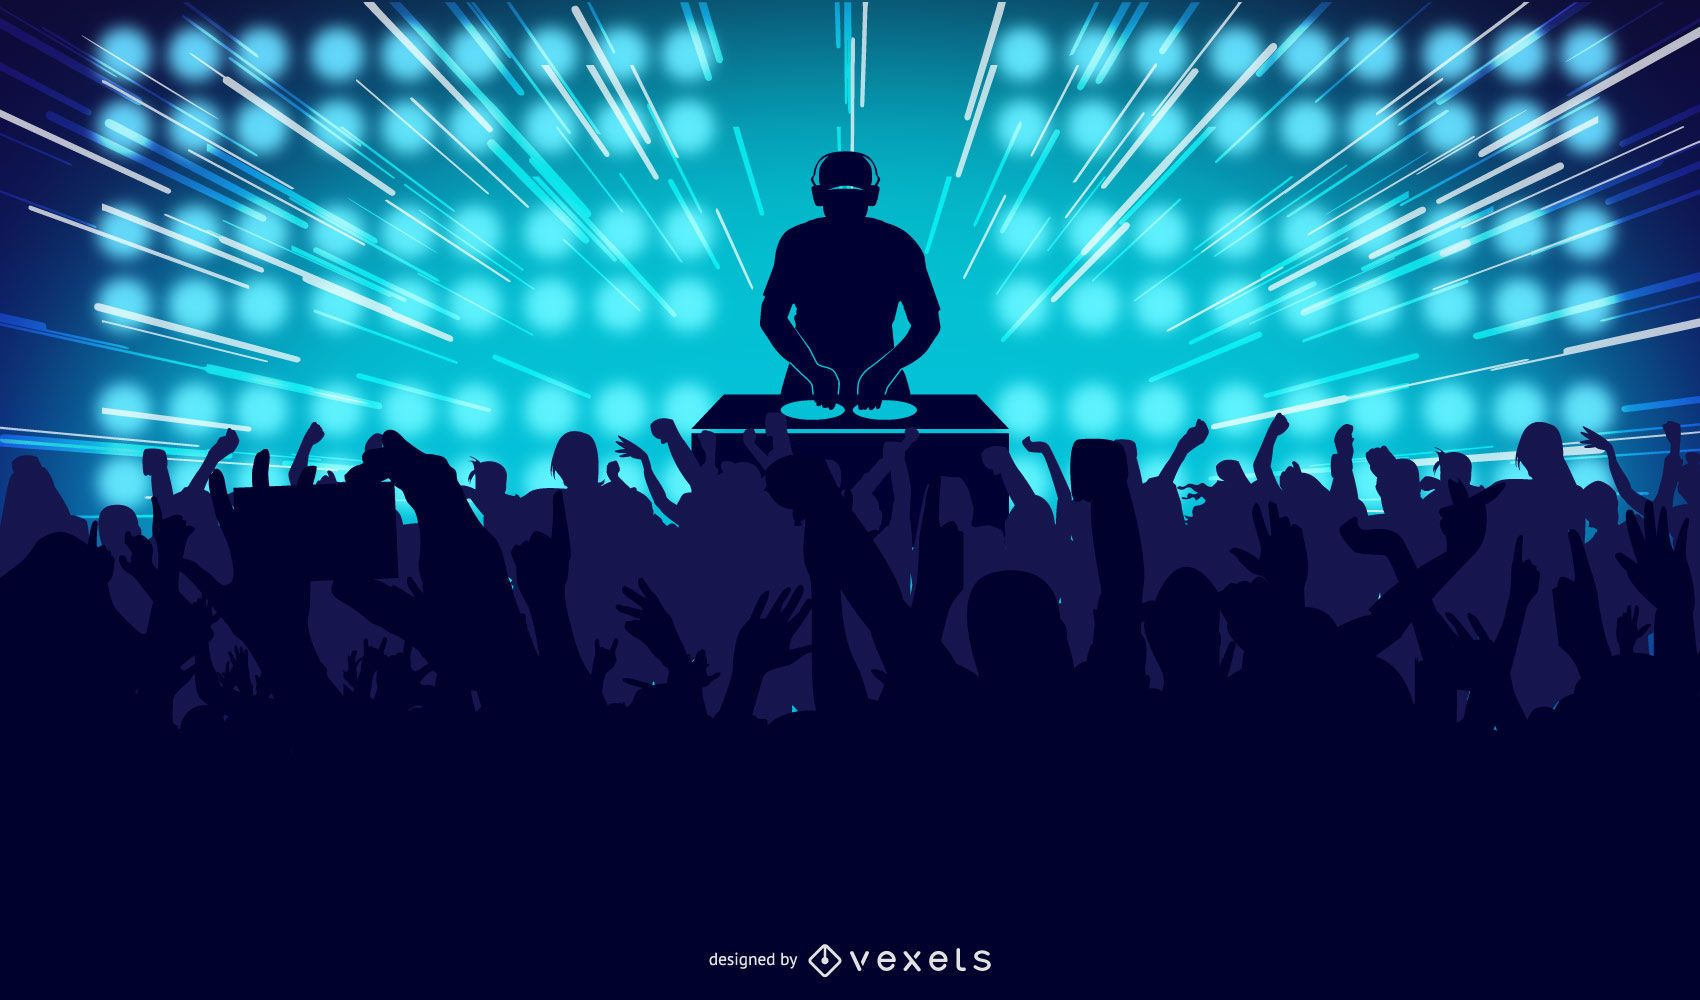 Dance Party Illustration